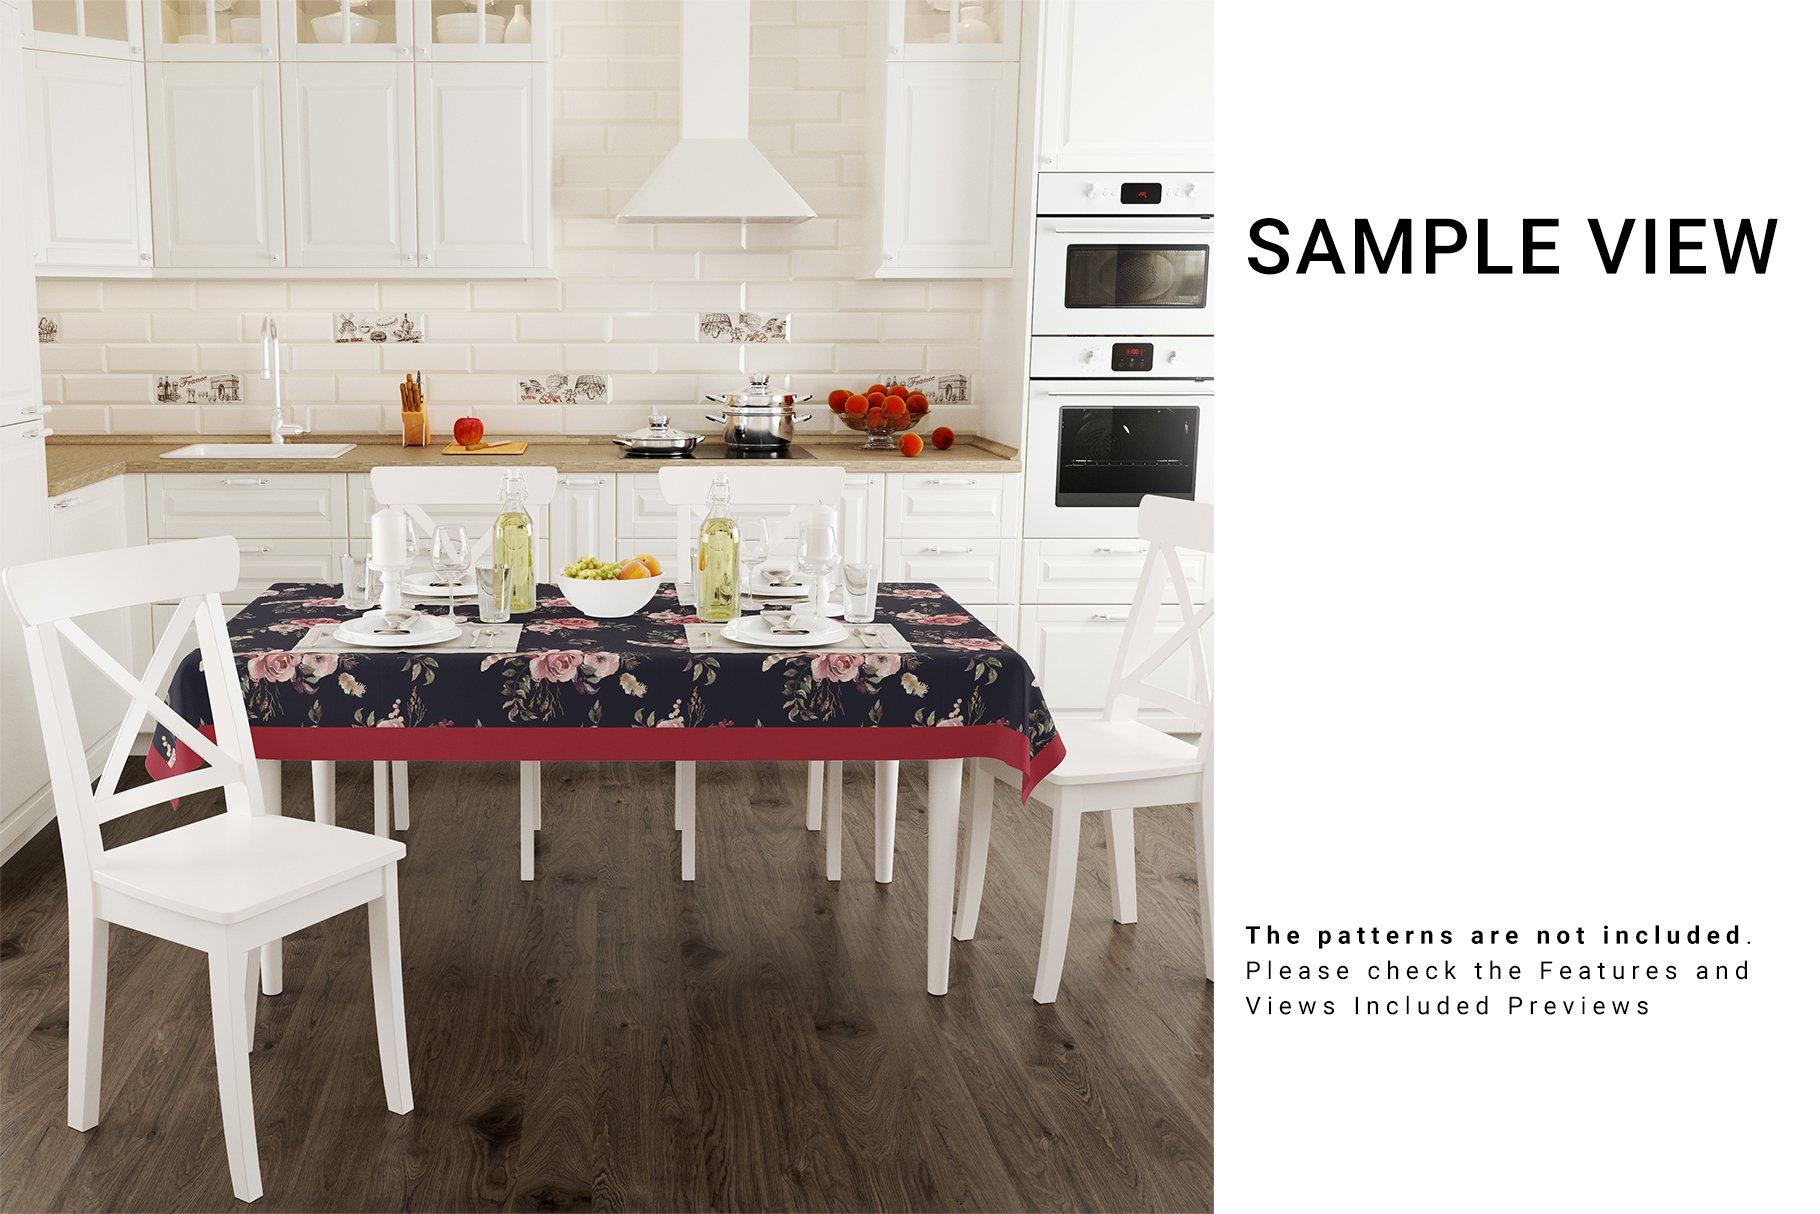 Kitchen Tablecloth 3D Mockup Set example image 6